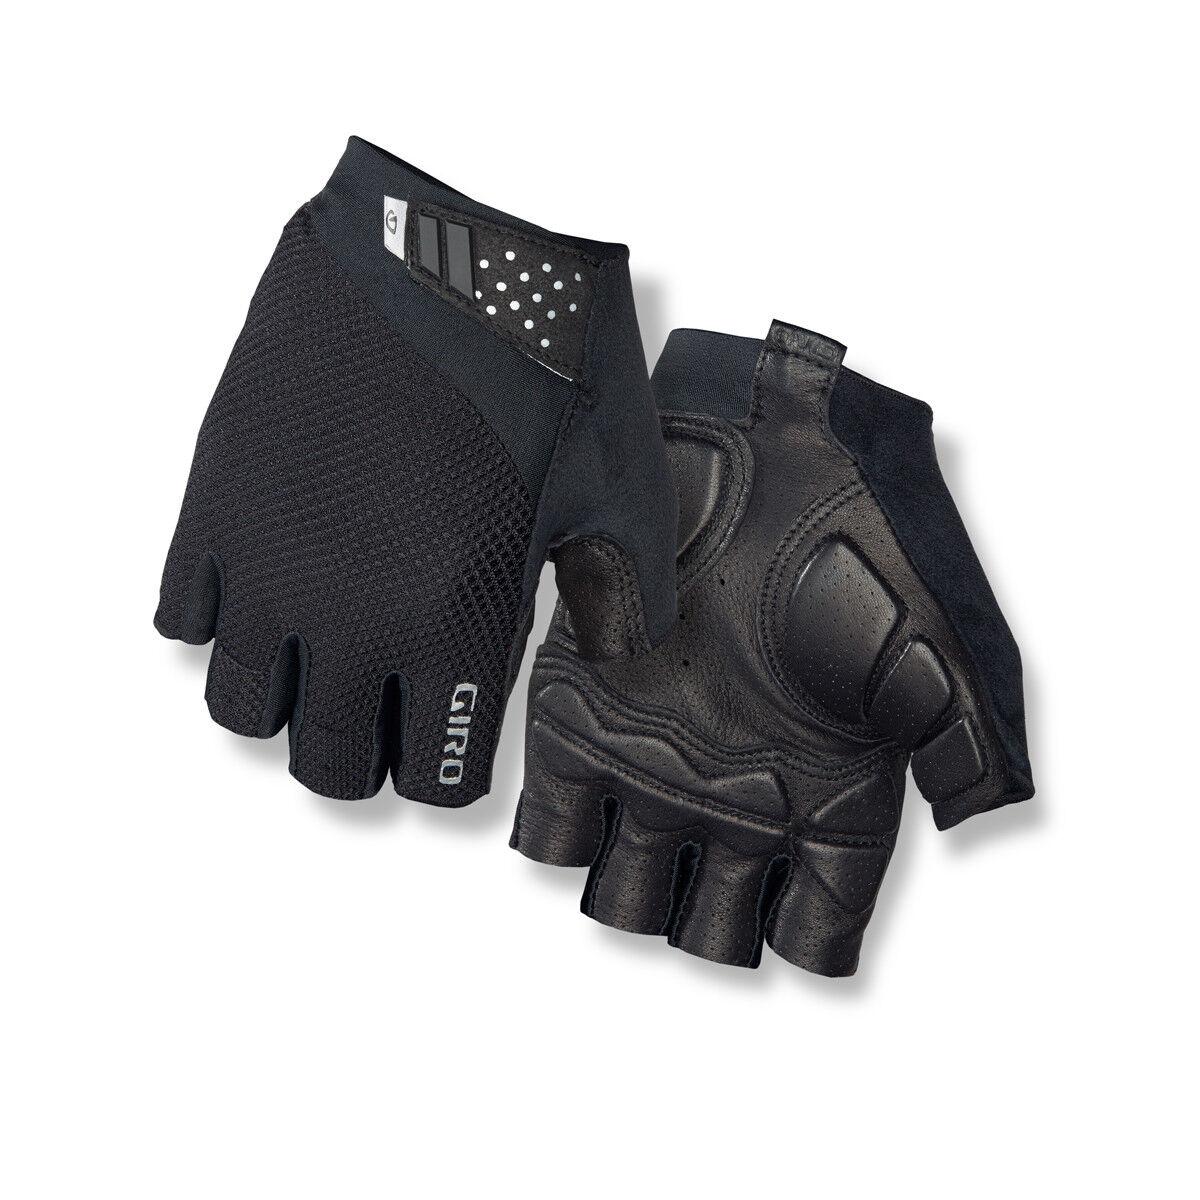 Giro Monaco II Gel Fahrrad Handschuhe Handschuhe Handschuhe kurz schwarz 2019 cf99b1